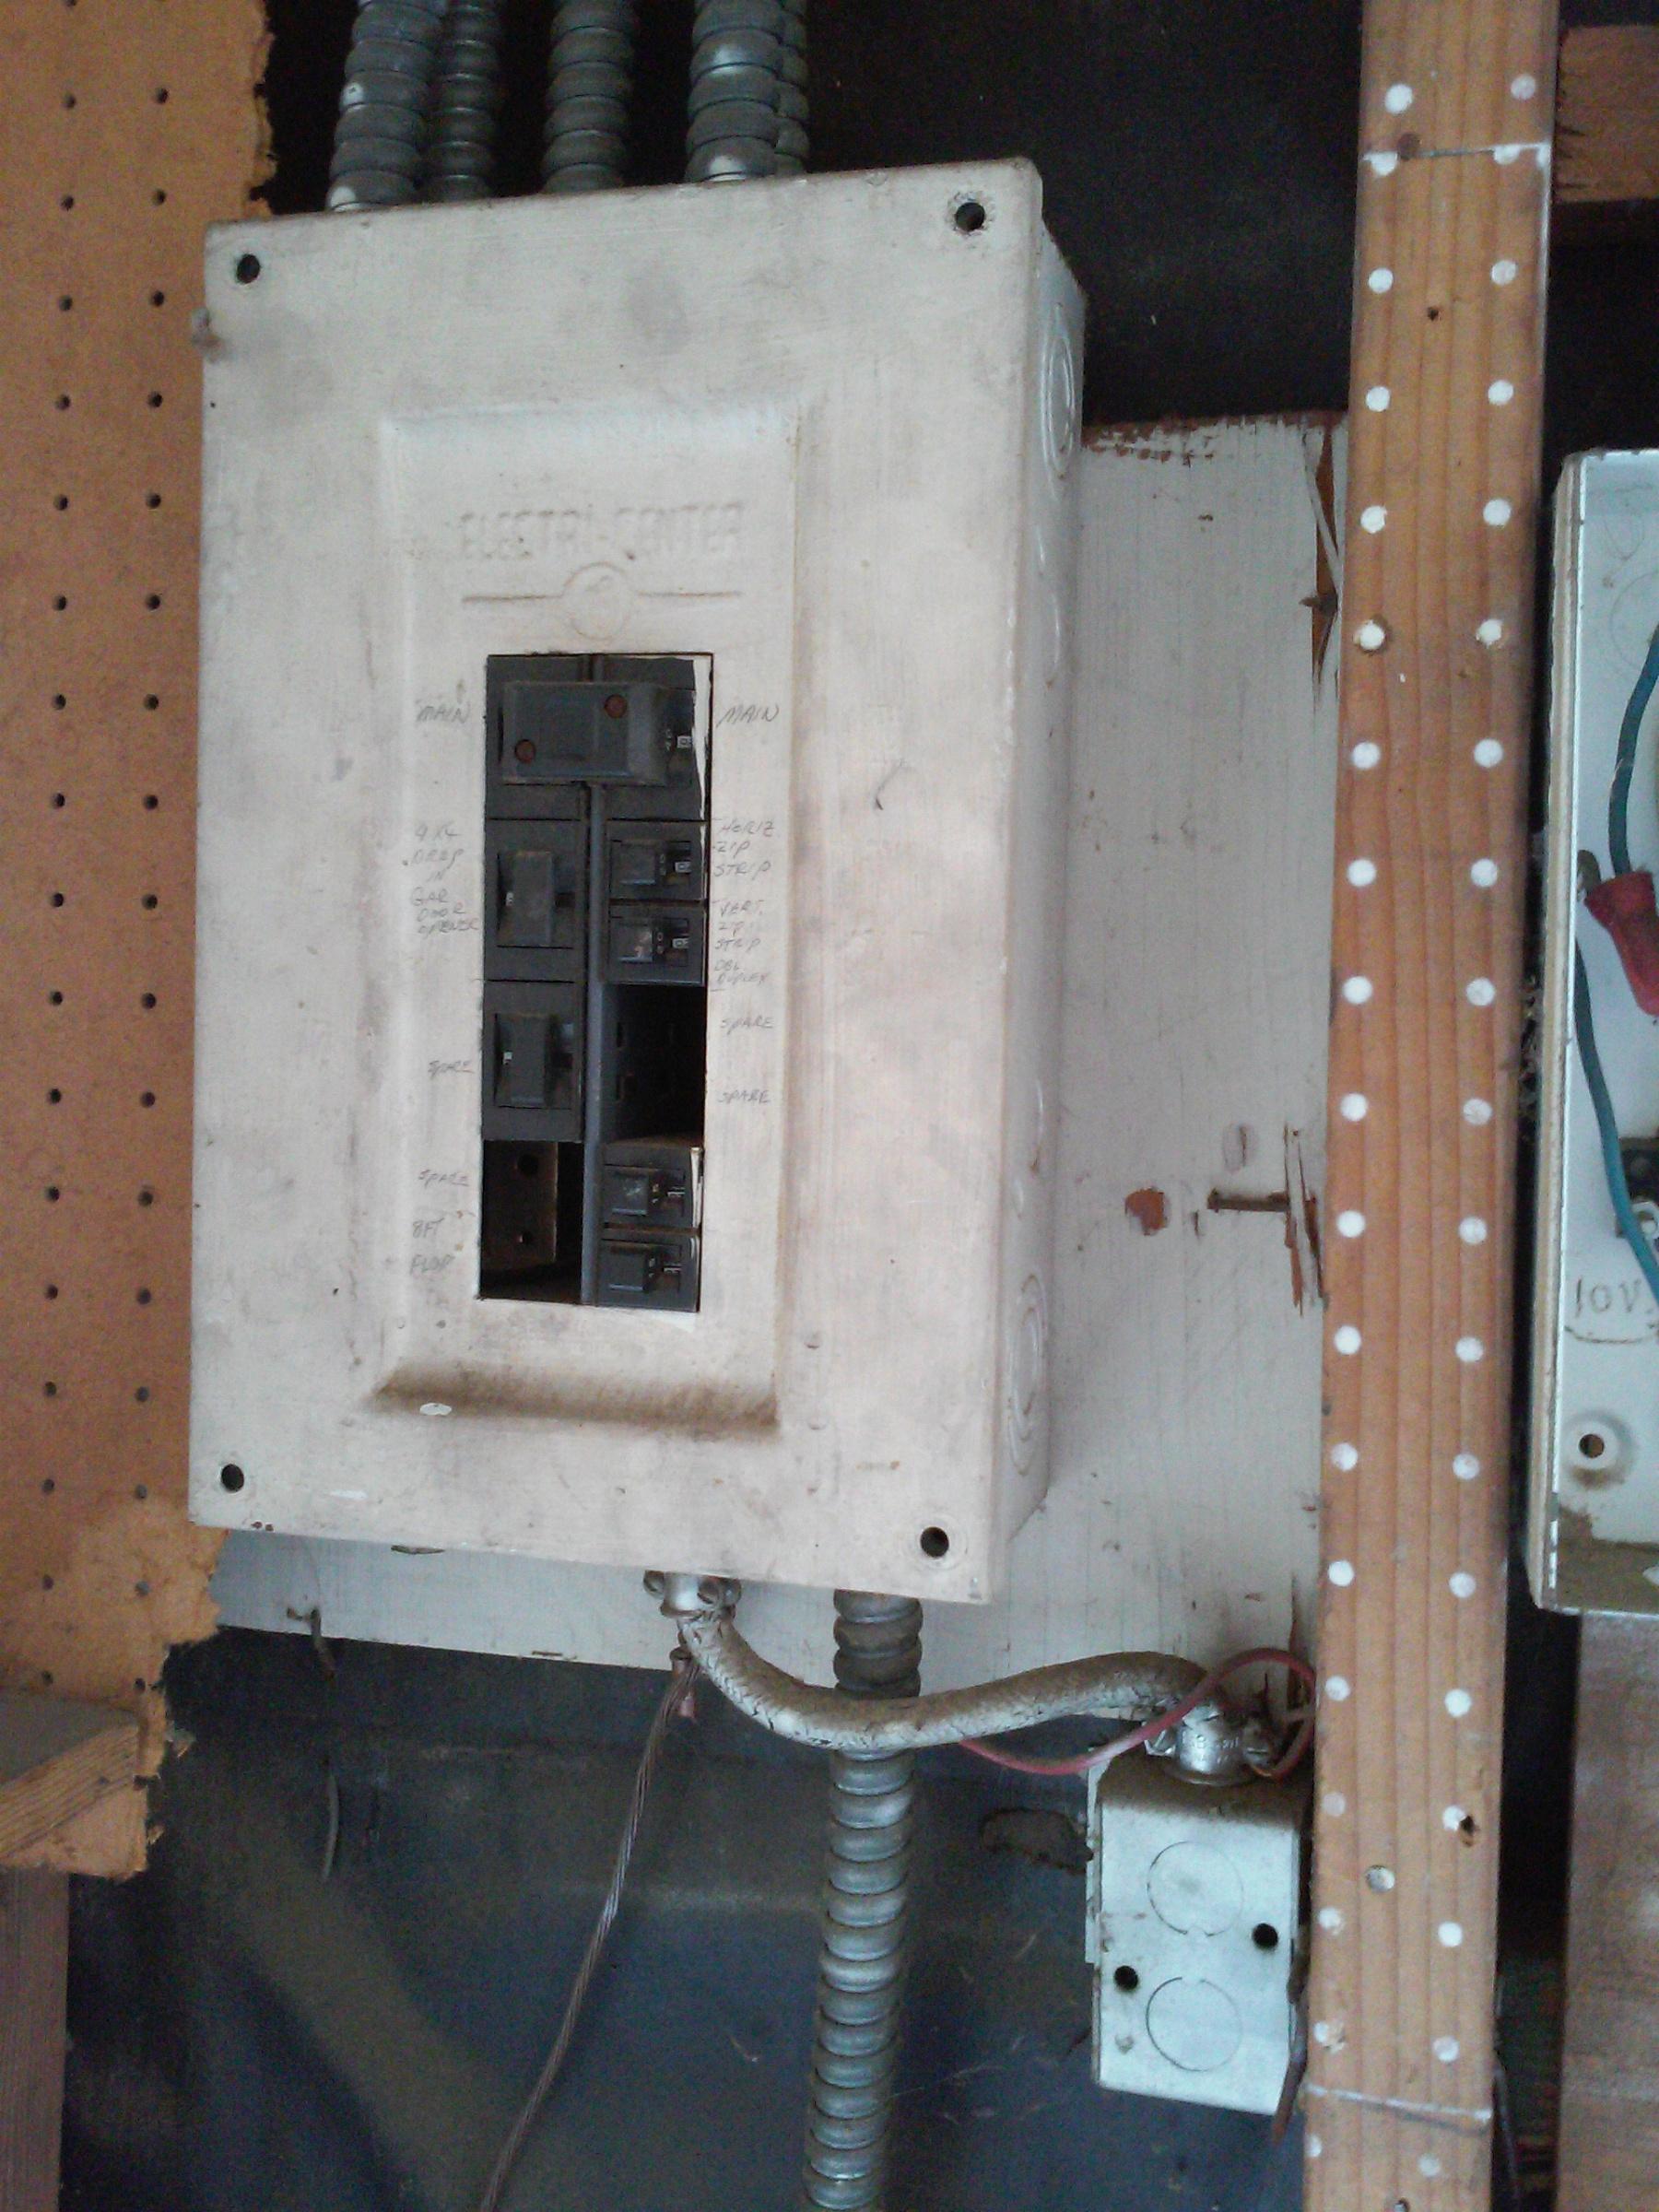 funky wiring in garage. Is this a hazard?-img_20190726_175604.jpg